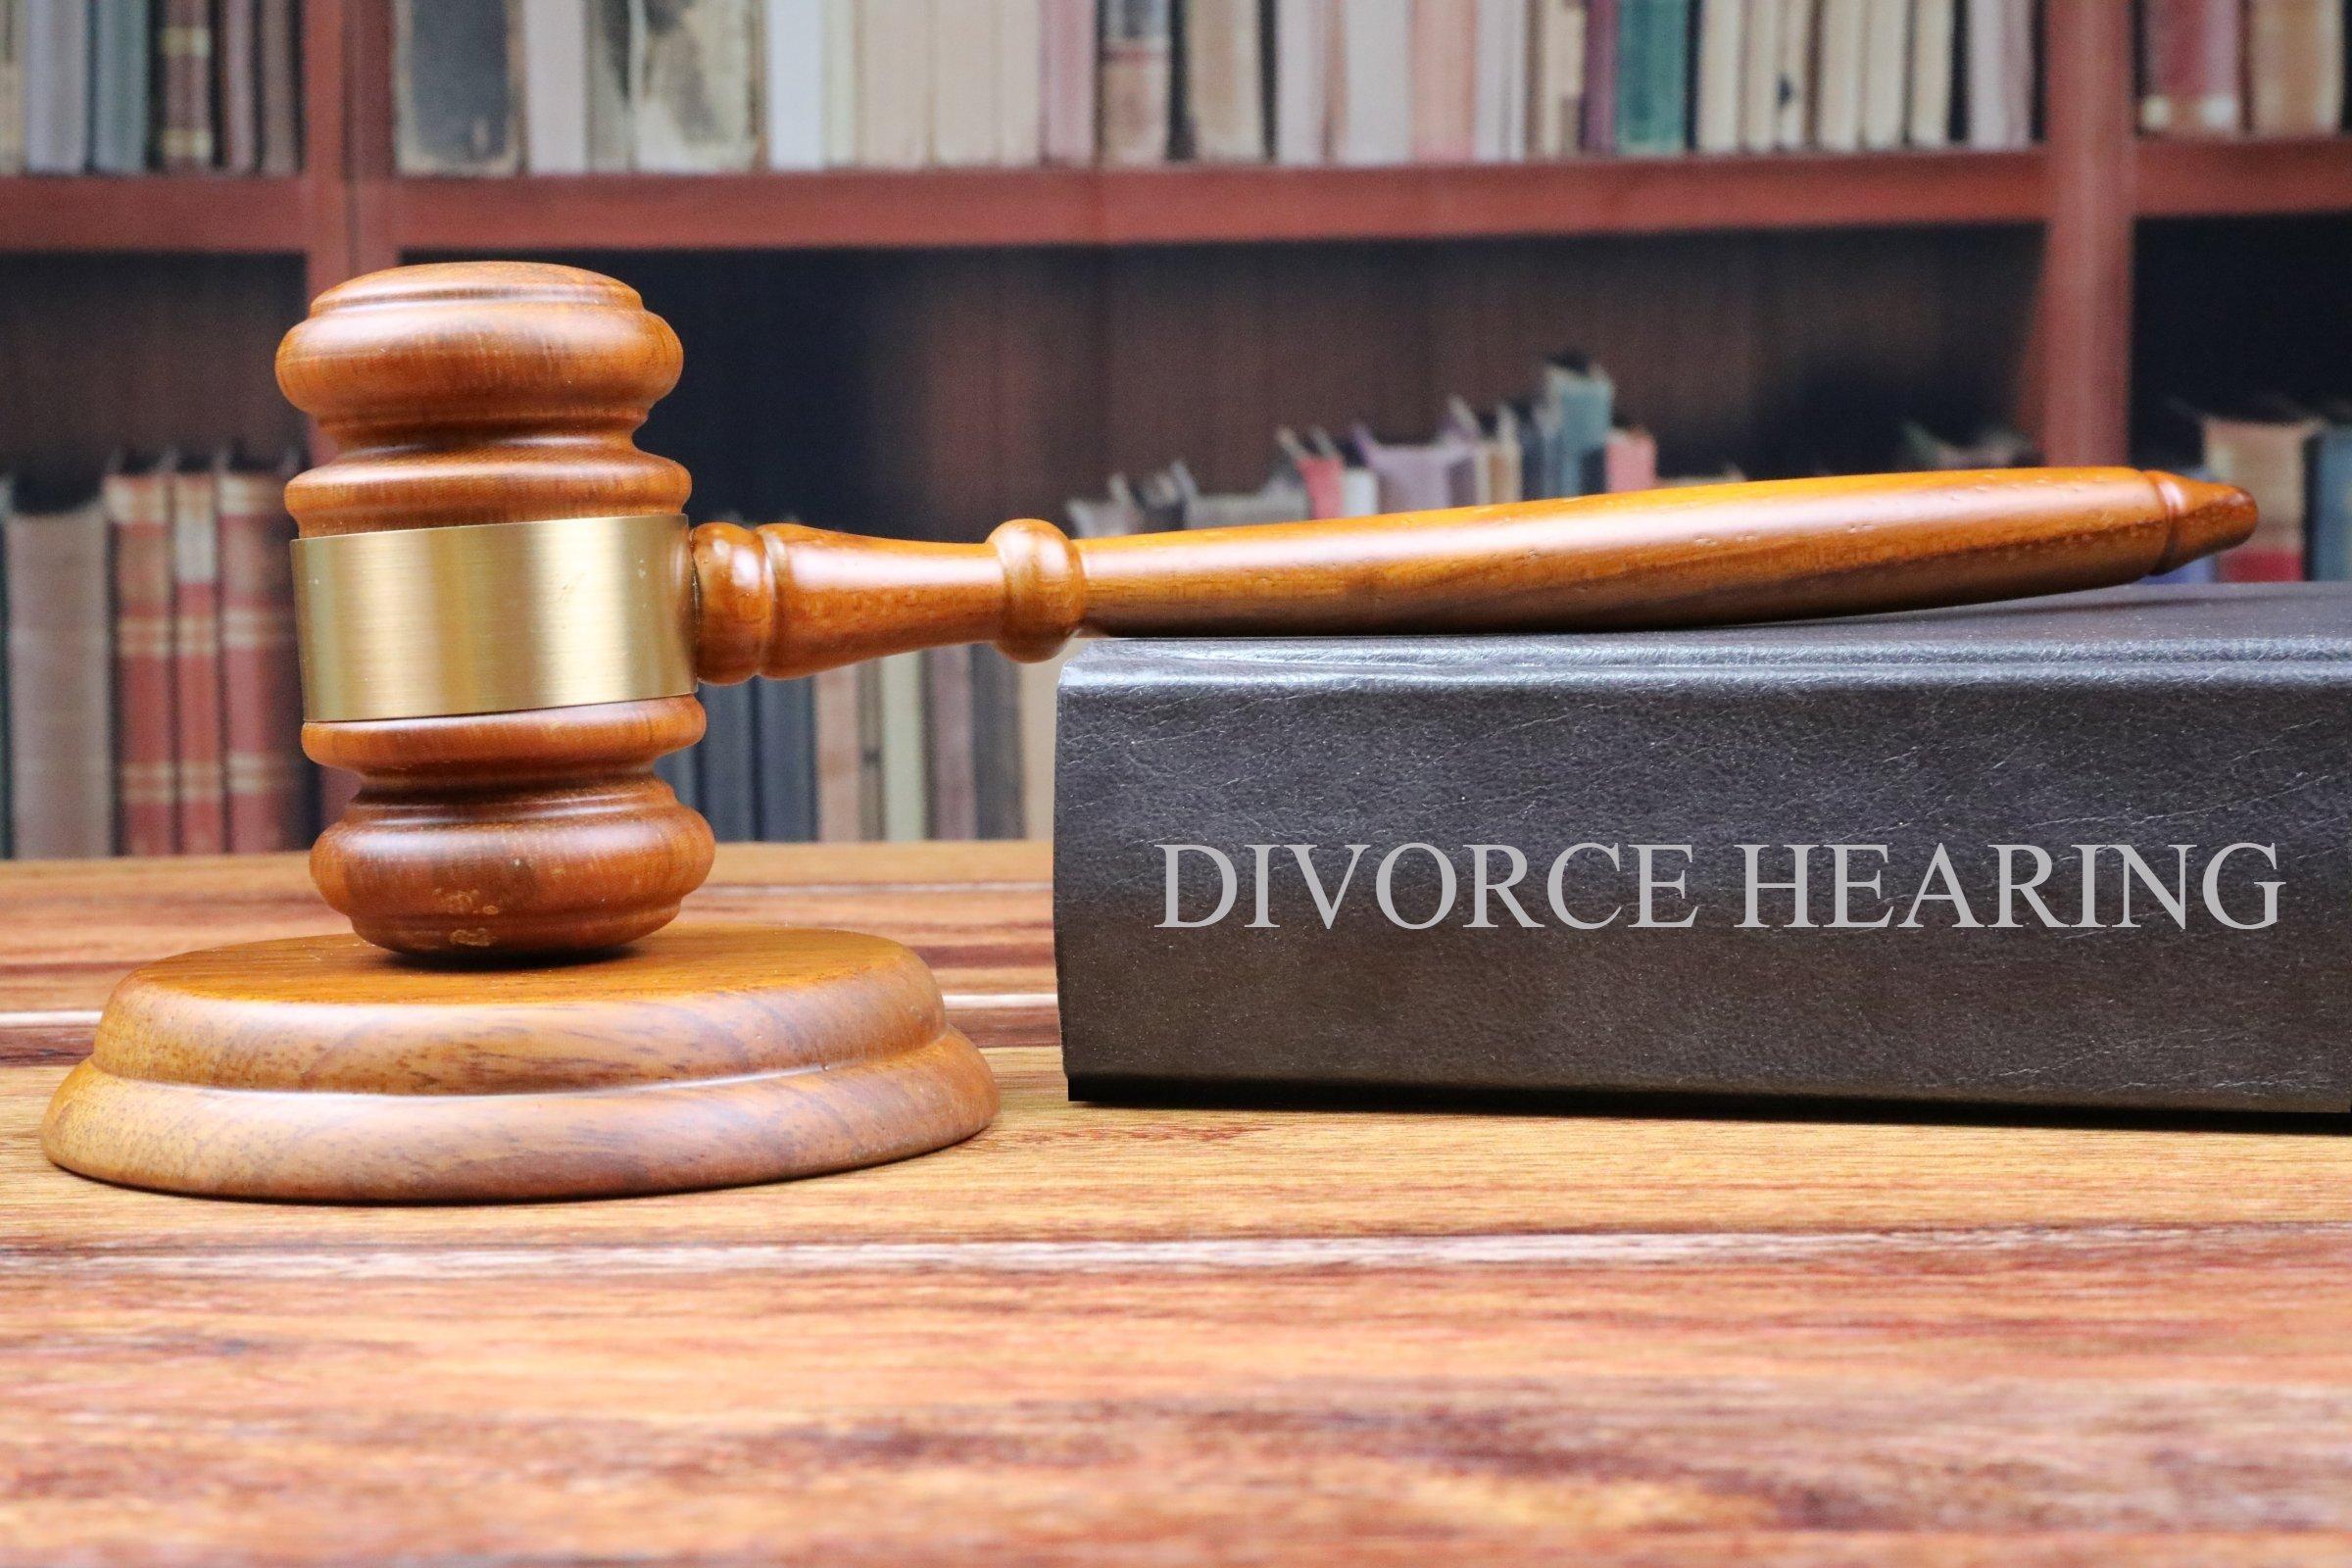 Divorce Hearing